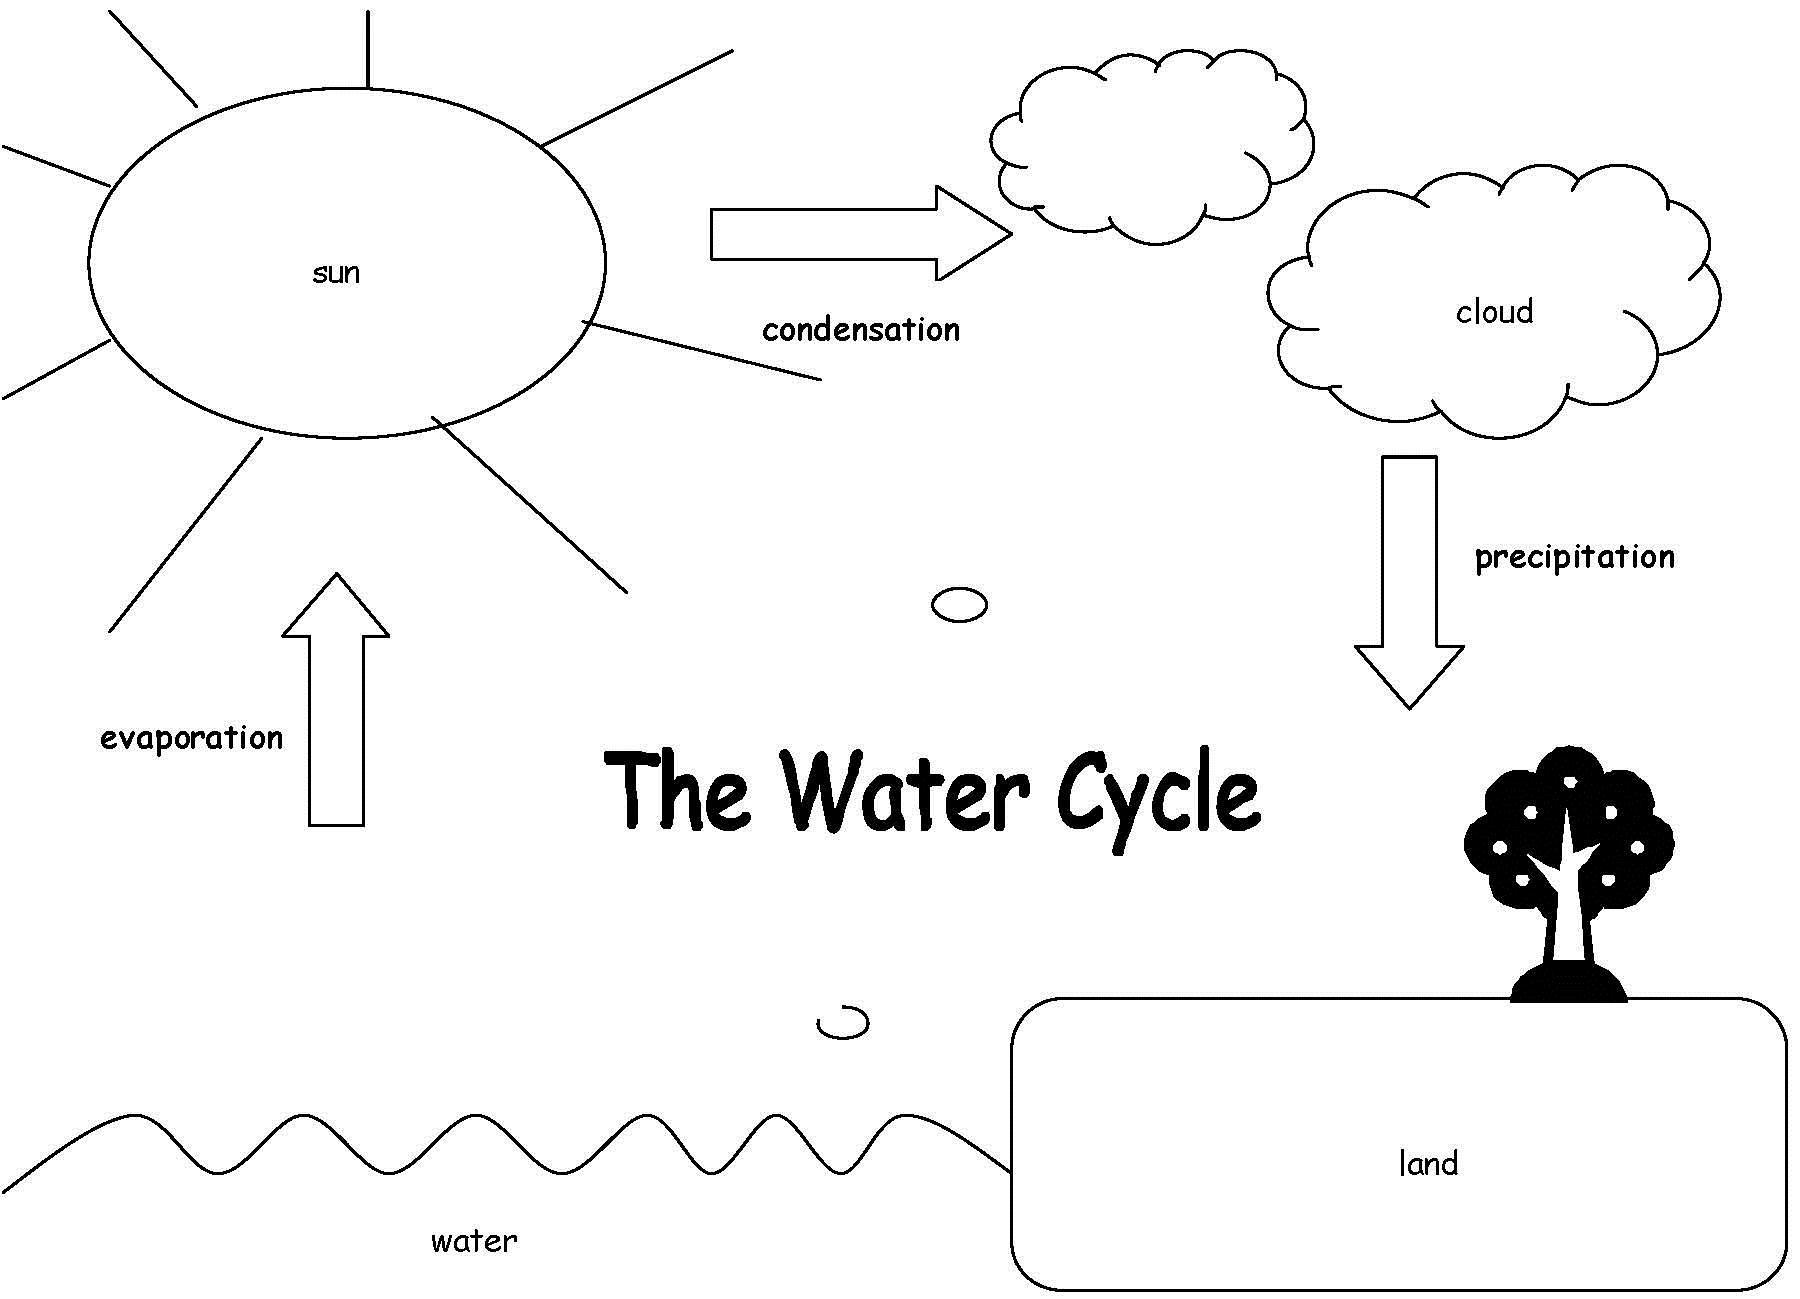 water cycle diagram australia